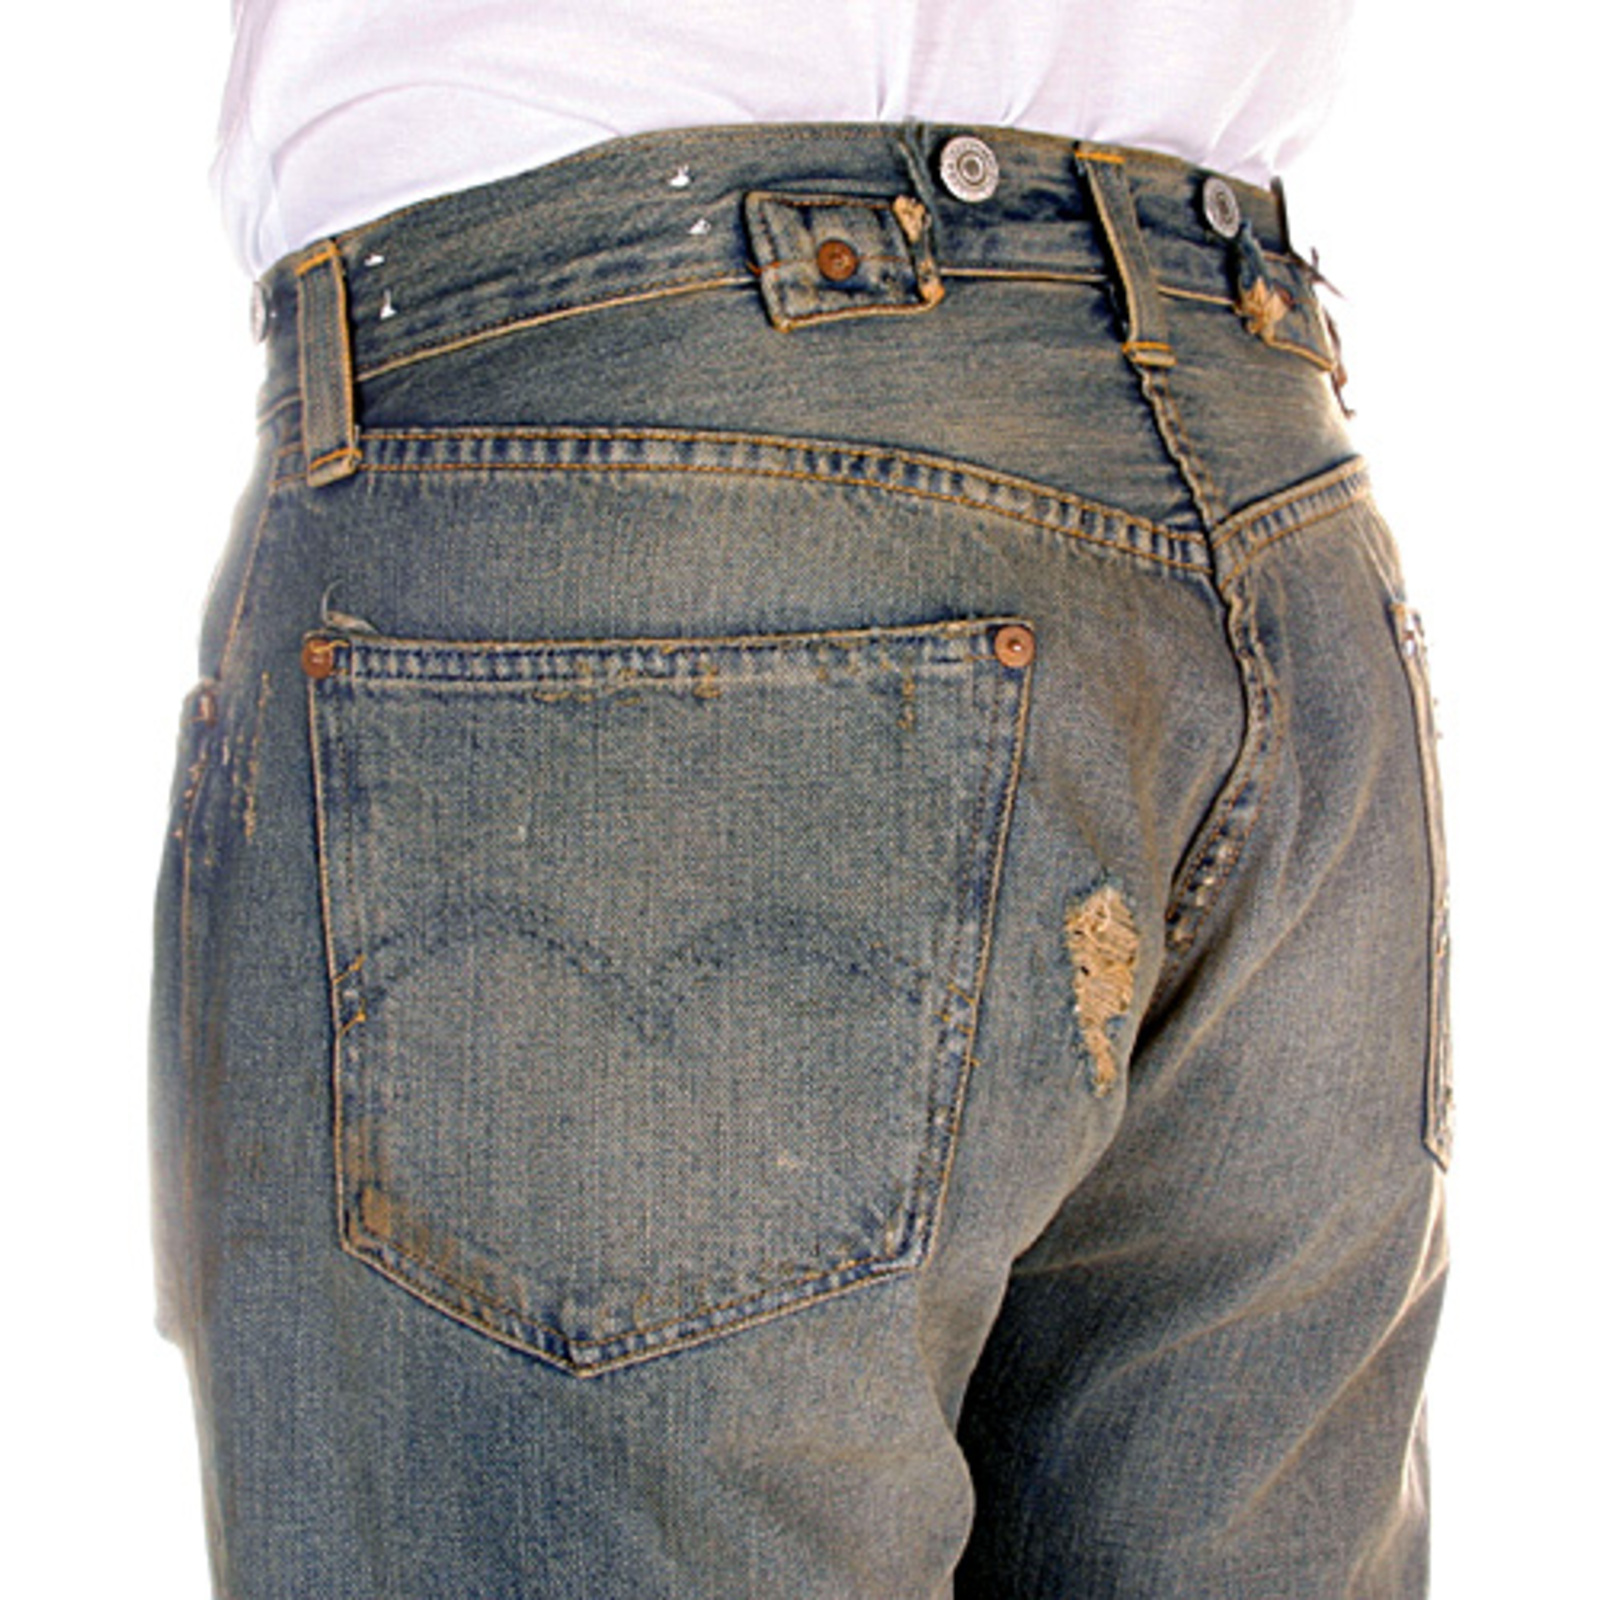 levis jeans vintage mens 1933 501 loose fit limited